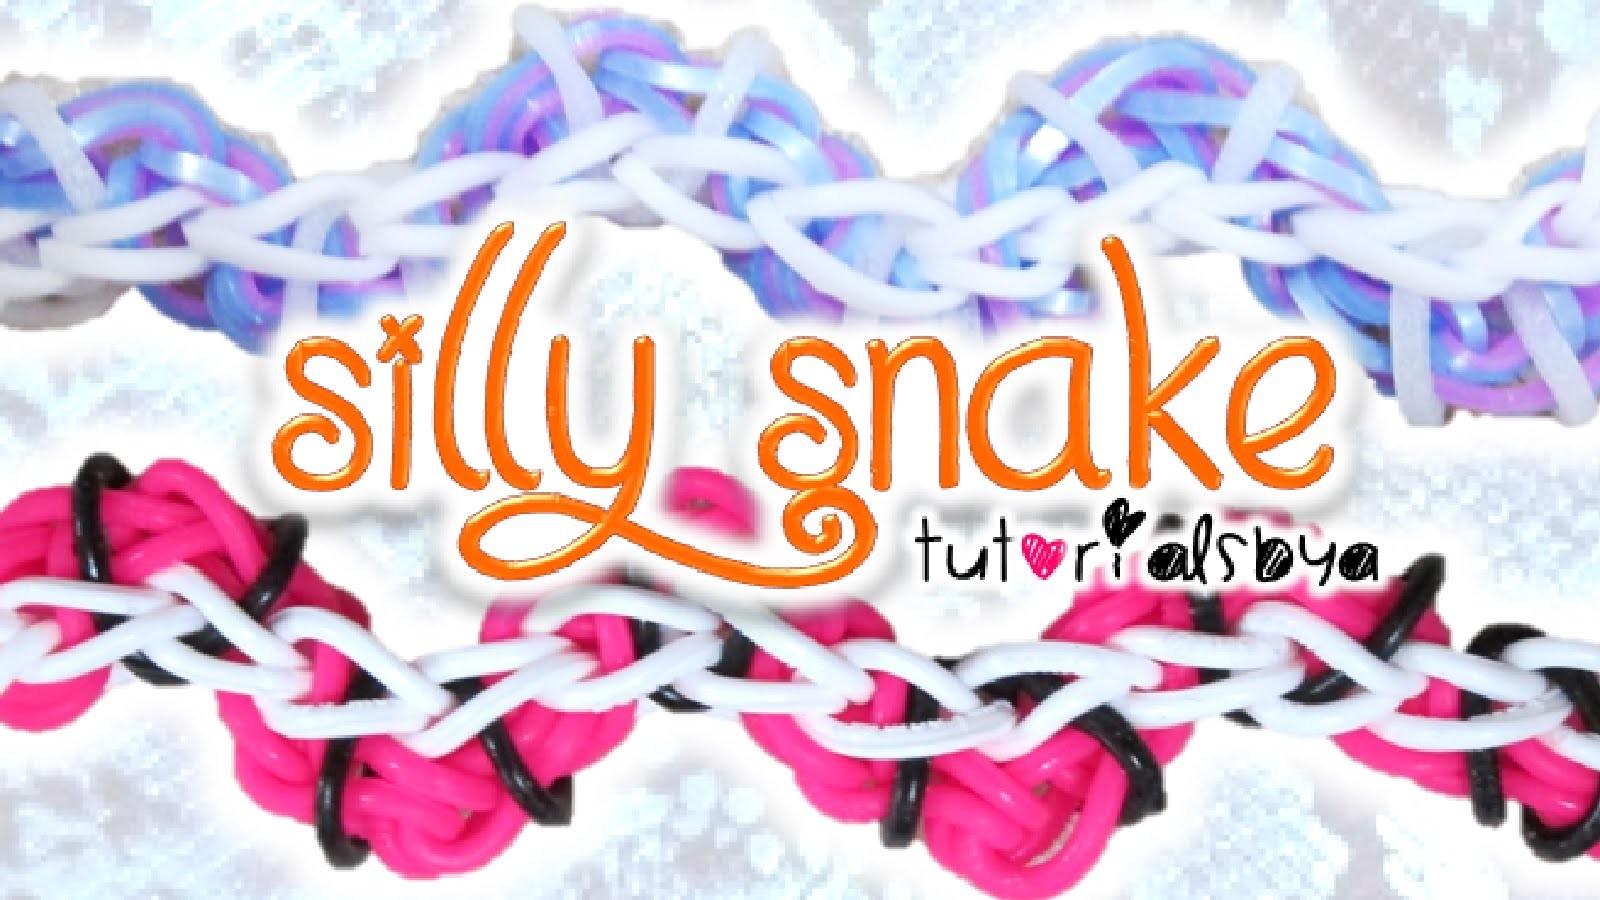 NEW Silly Snake Rainbow Loom Bracelet Tutorial | How To